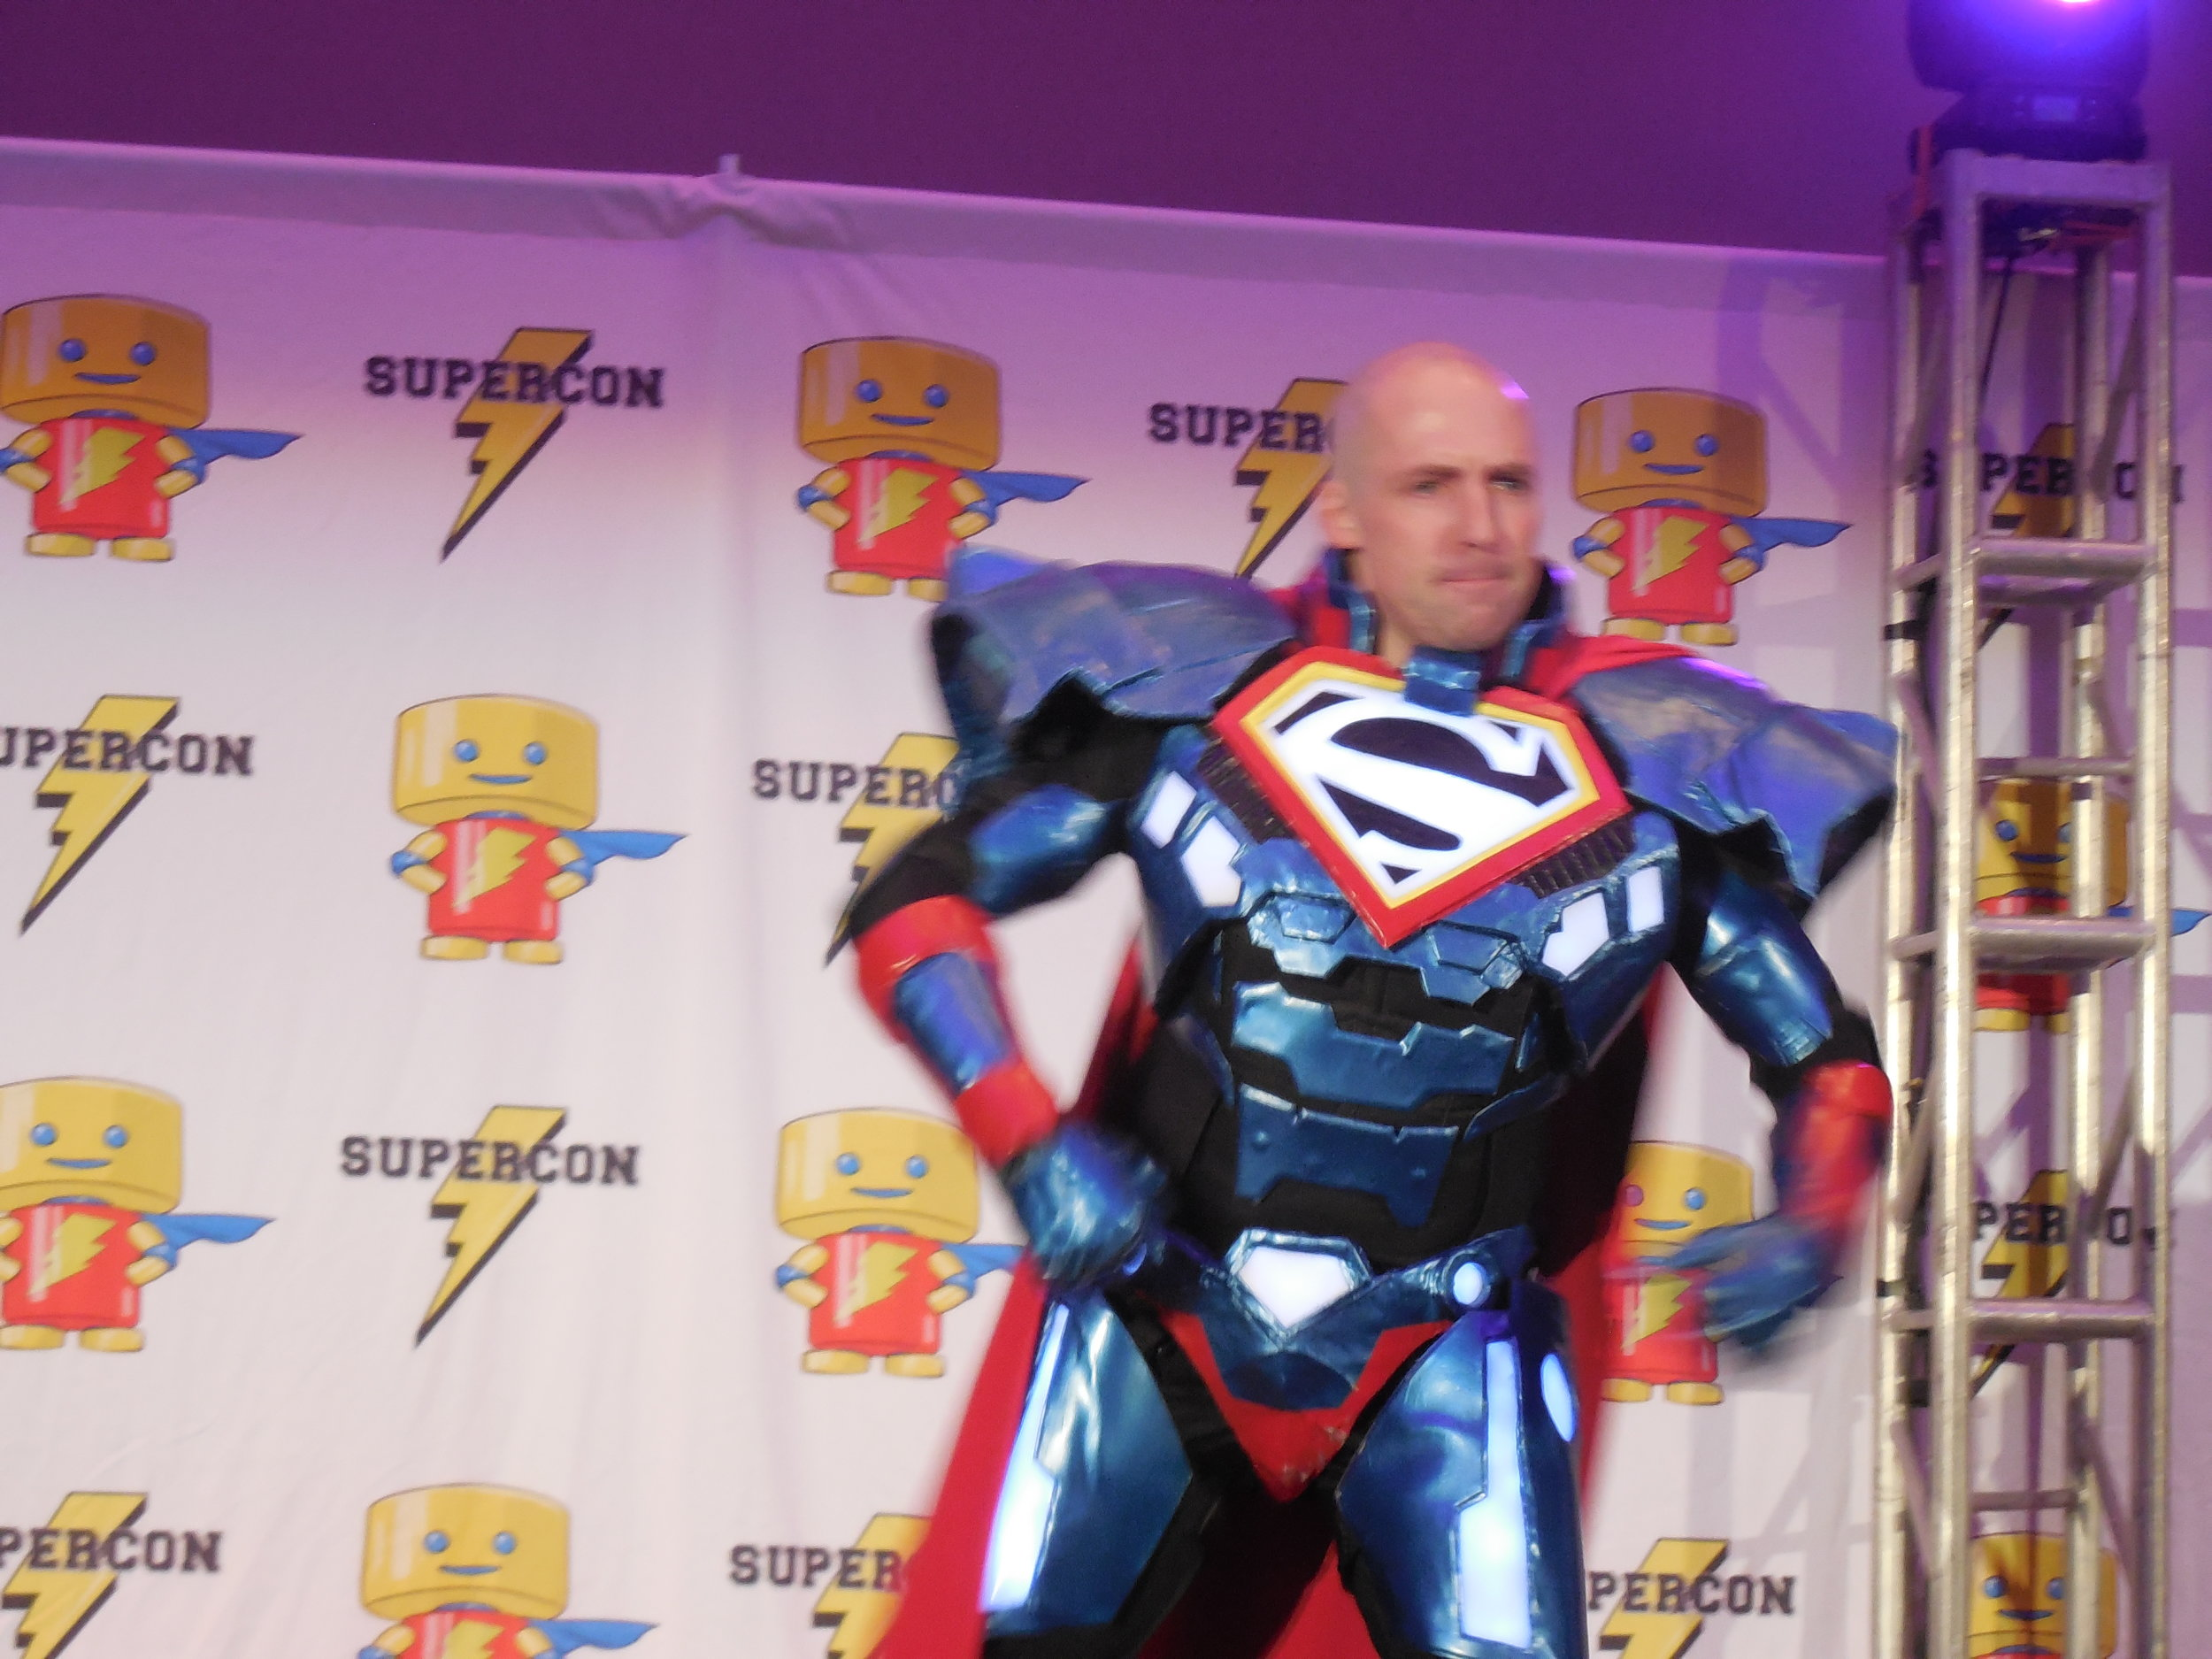 Supercon 2016 Cosplay Contest (65).JPG